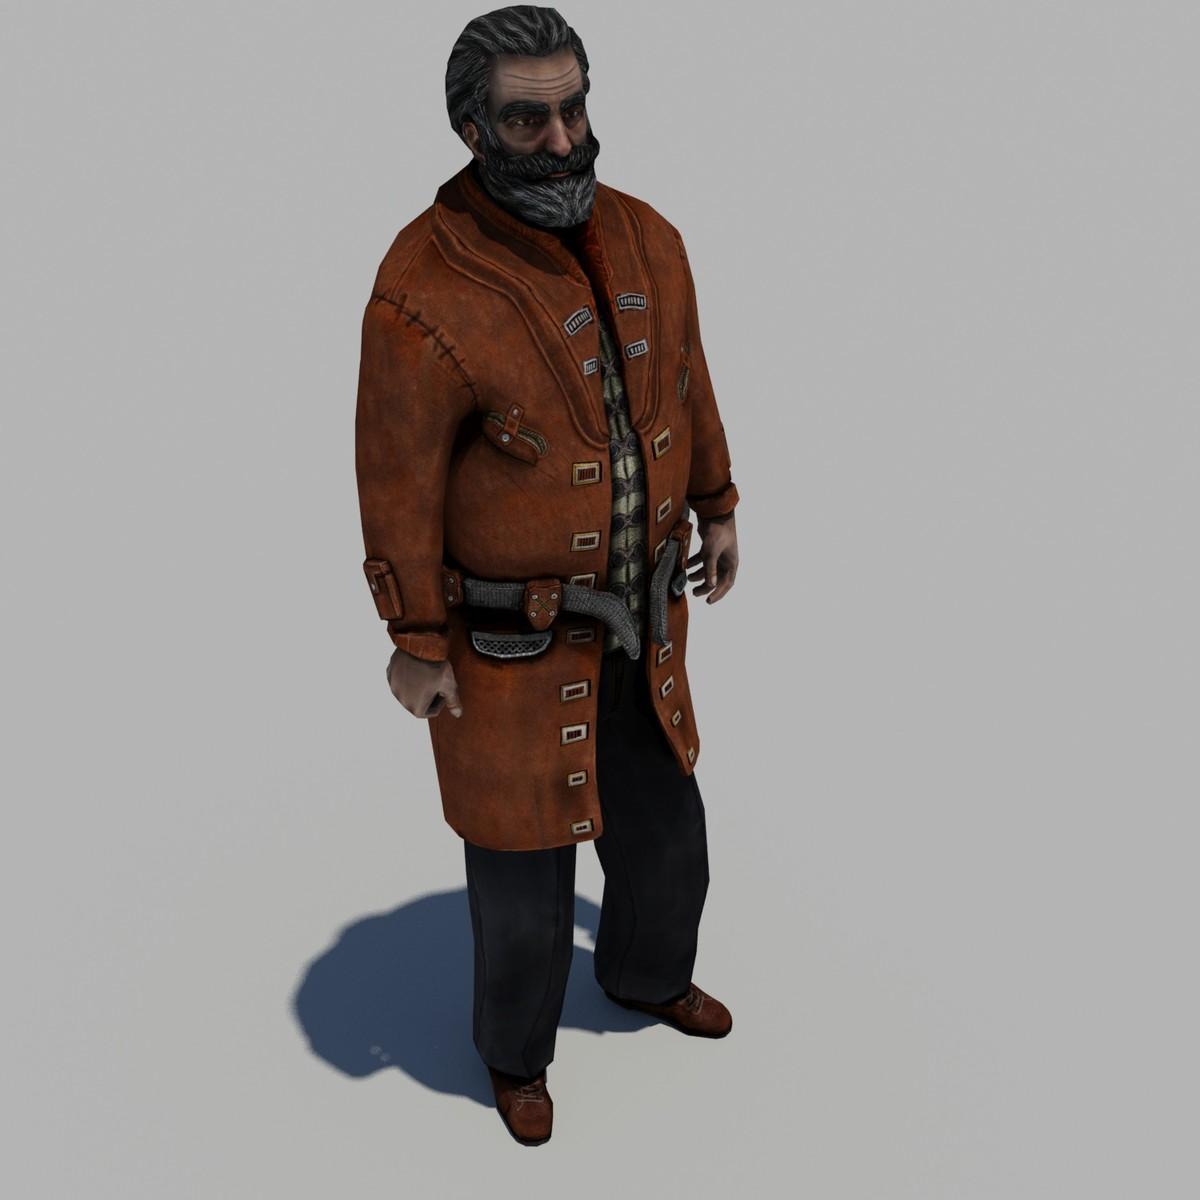 scientist character 3d max